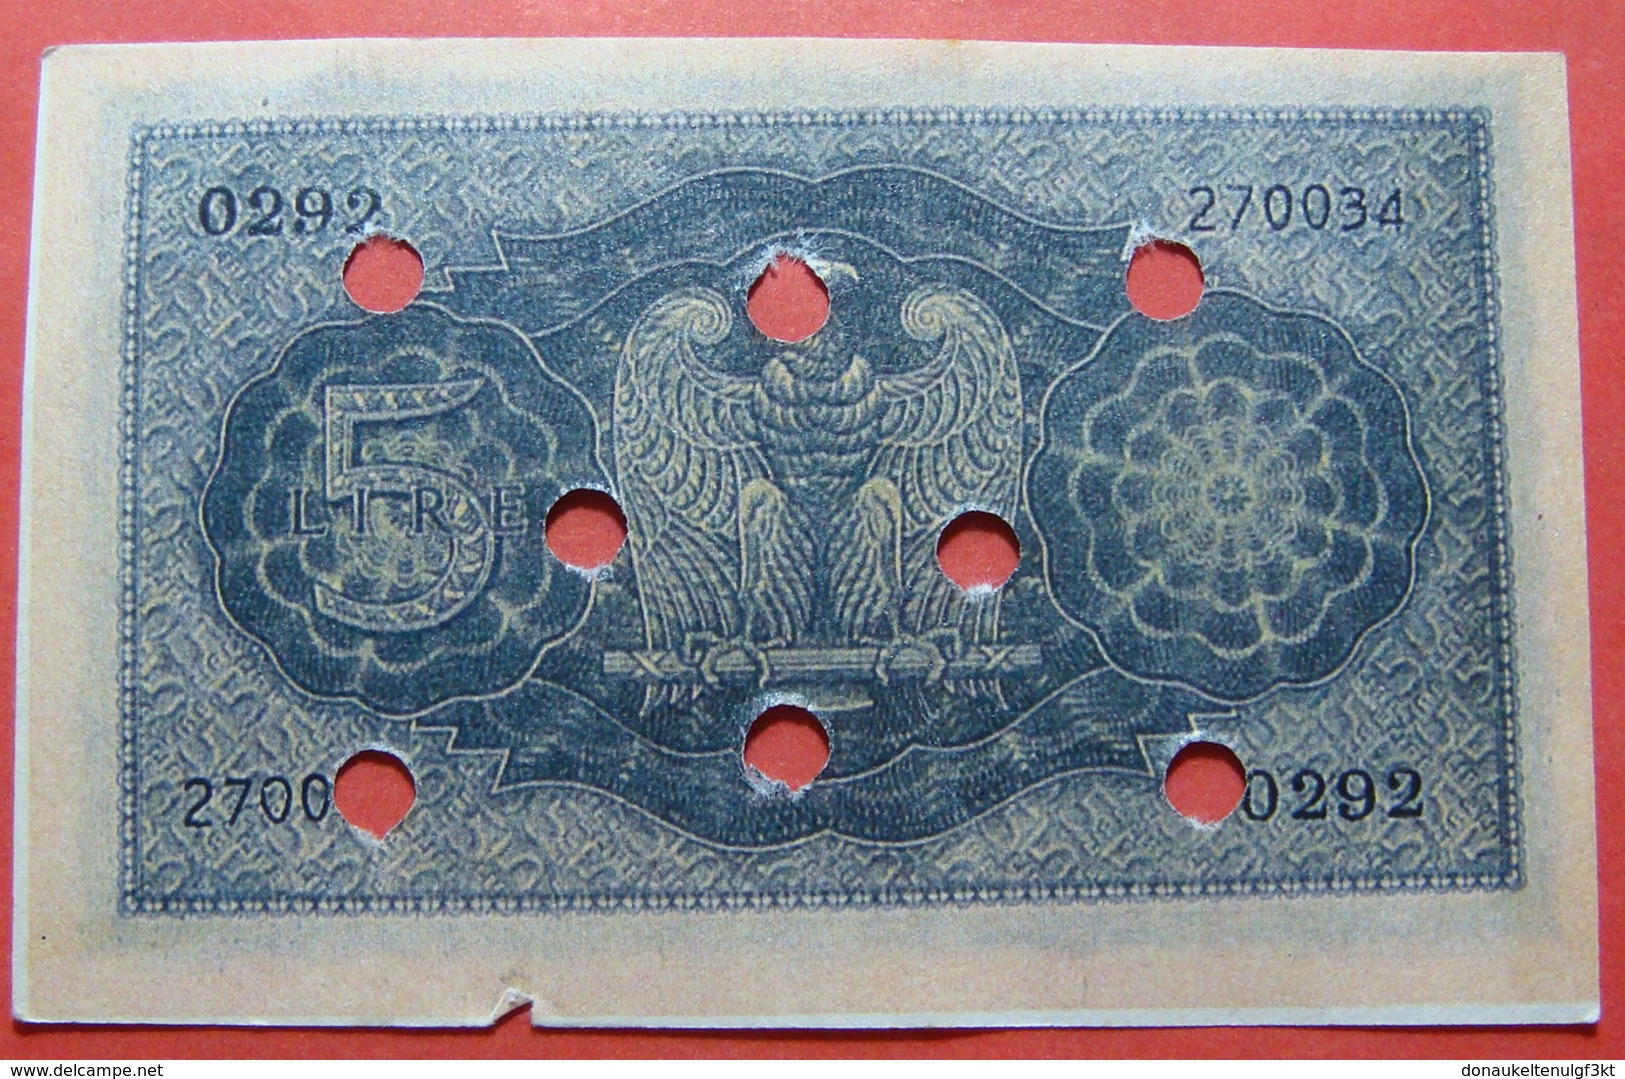 ITALIA 5 LIRE 1939 FORGERY, BANK CANCELLATION - [ 1] …-1946 : Royaume